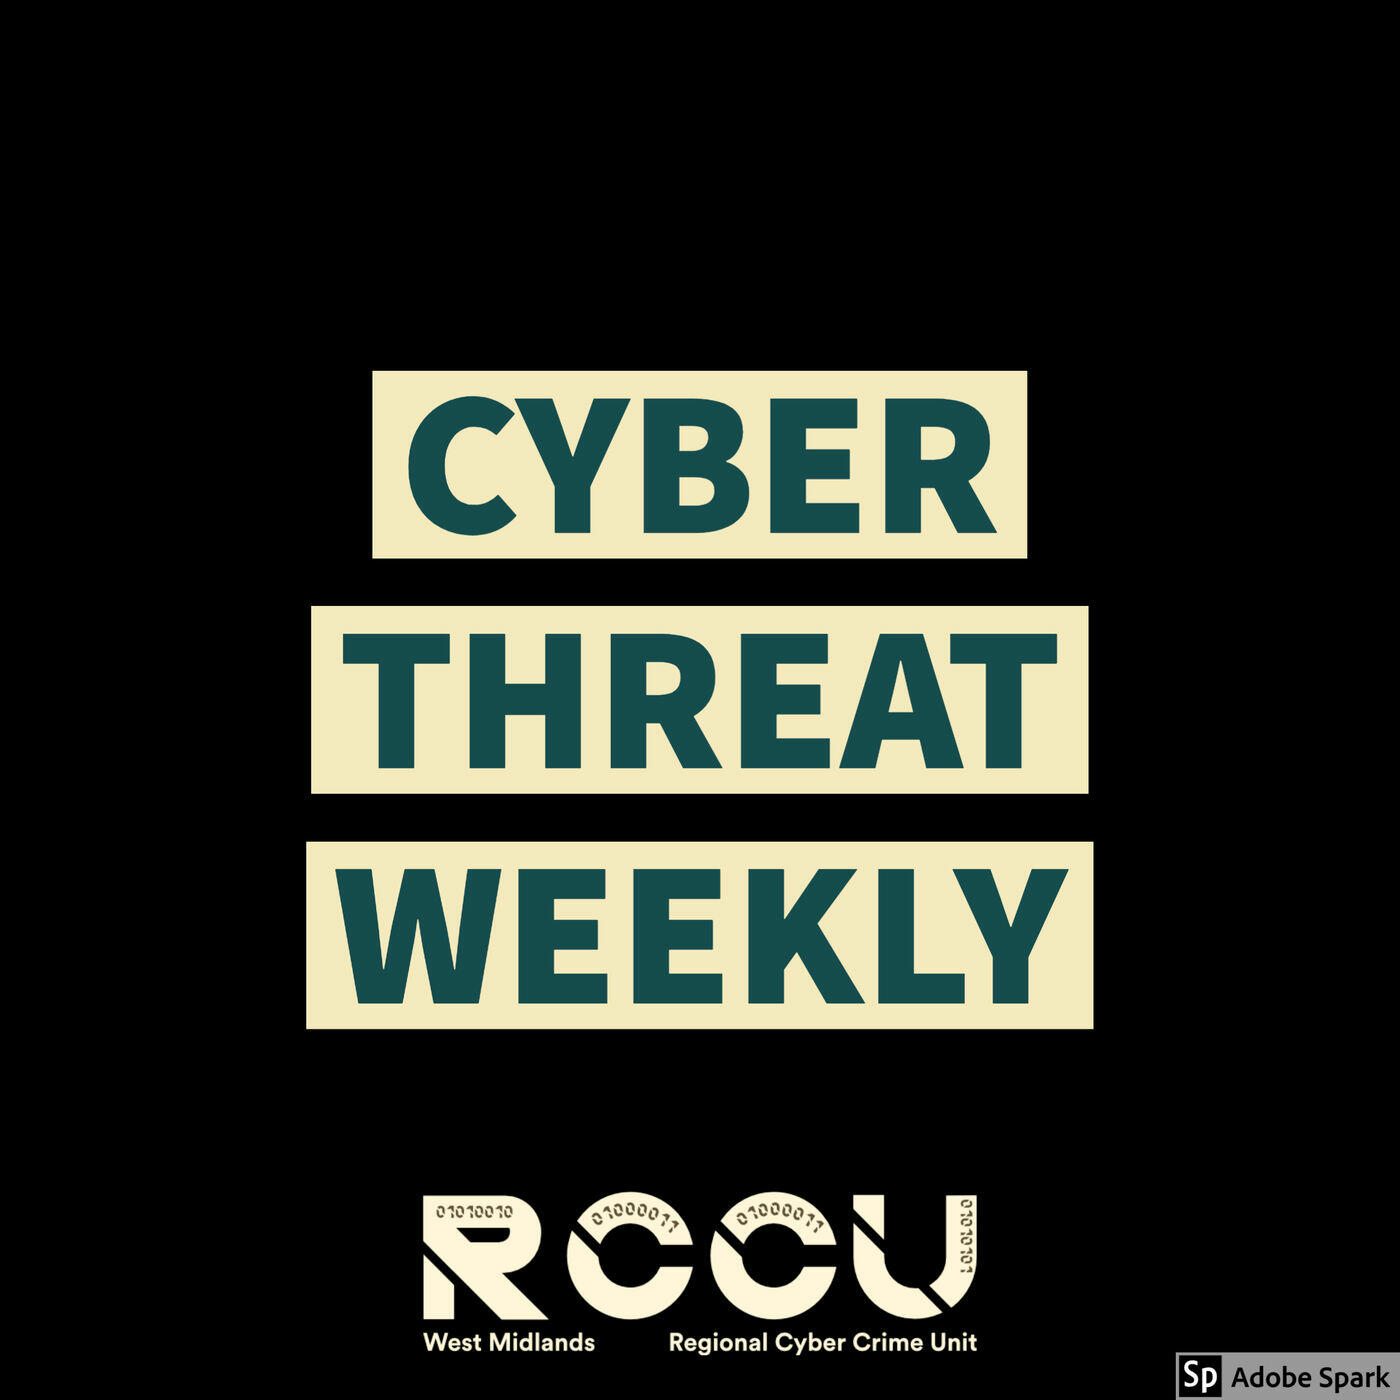 Cyber Threat Weekly